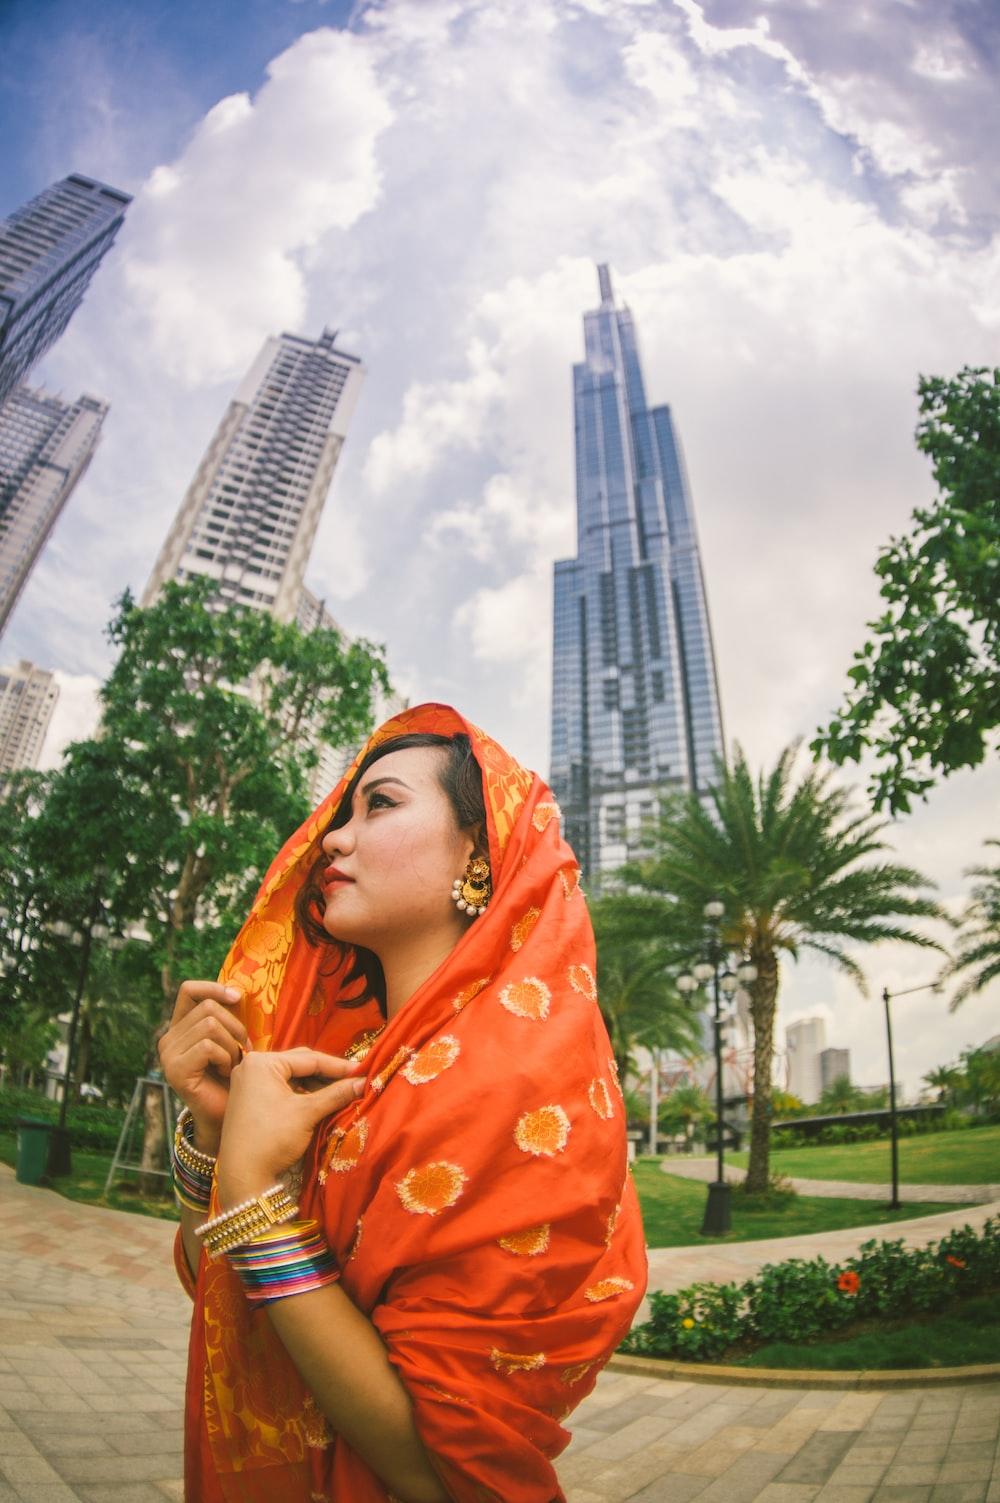 woman wears orange sari dress